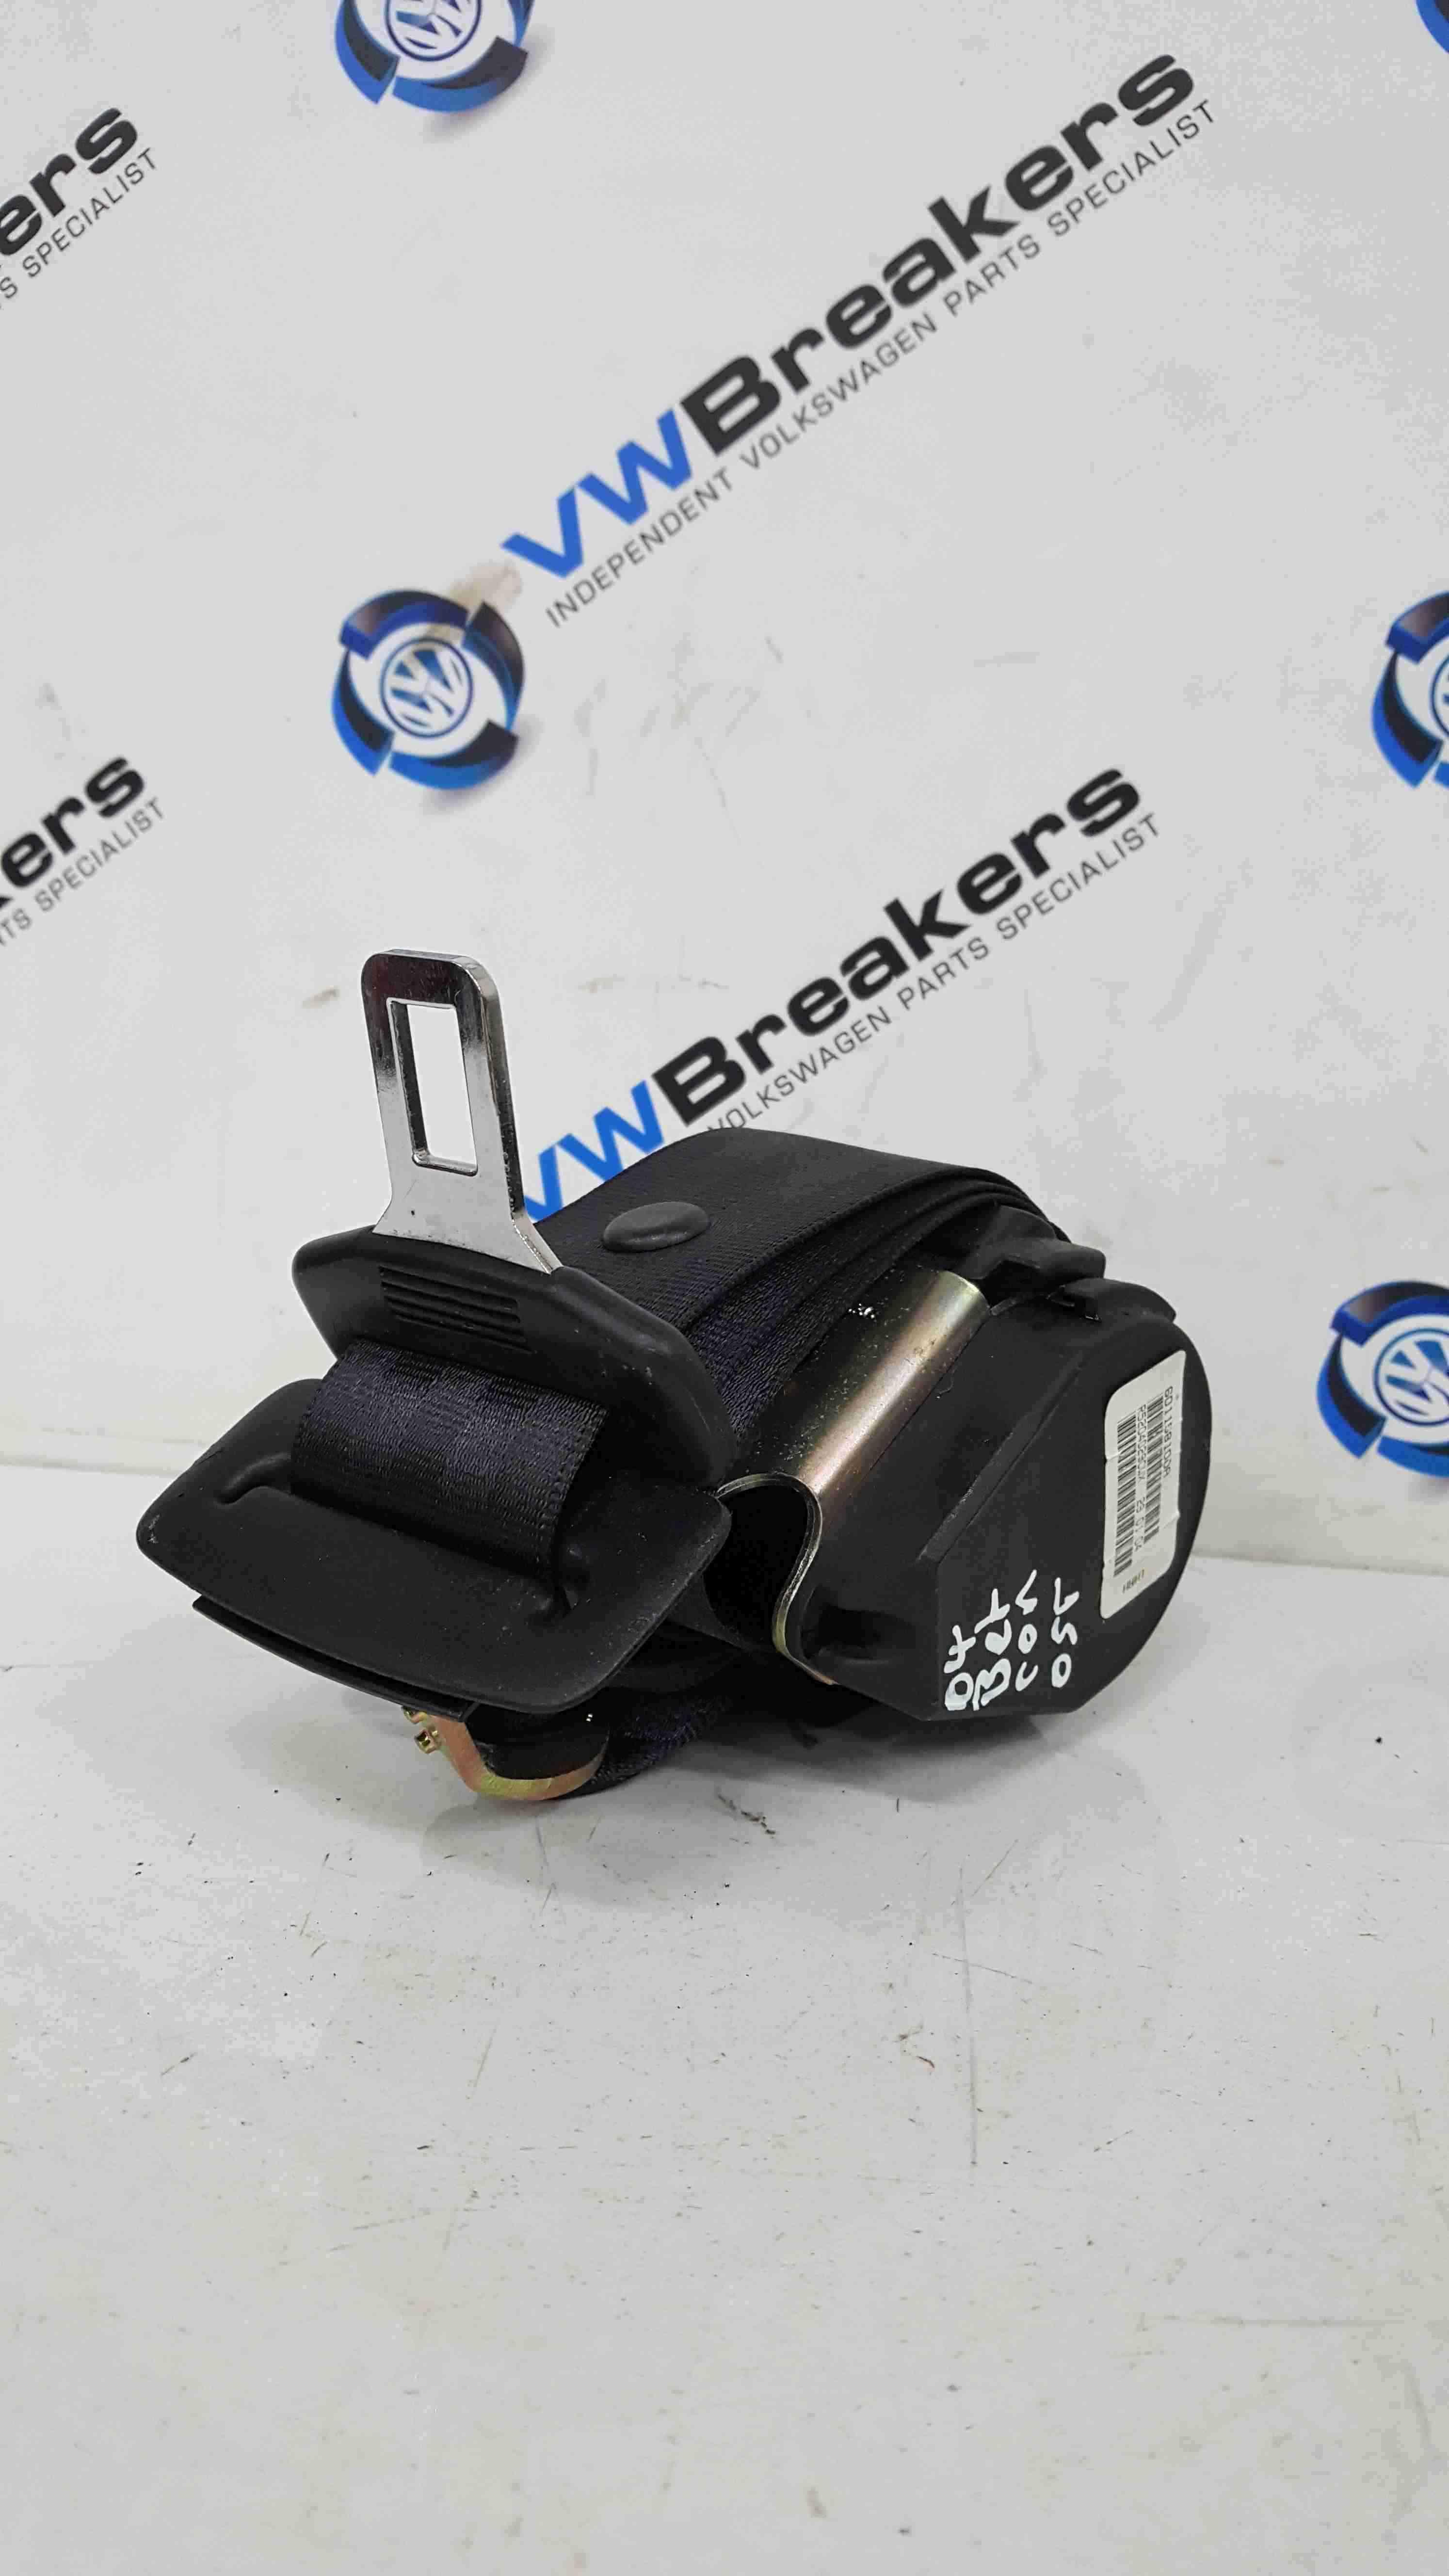 Volkswagen Beetle Convertible 2002-2006 Drivers OSR Rear Seat Belt 601158100A